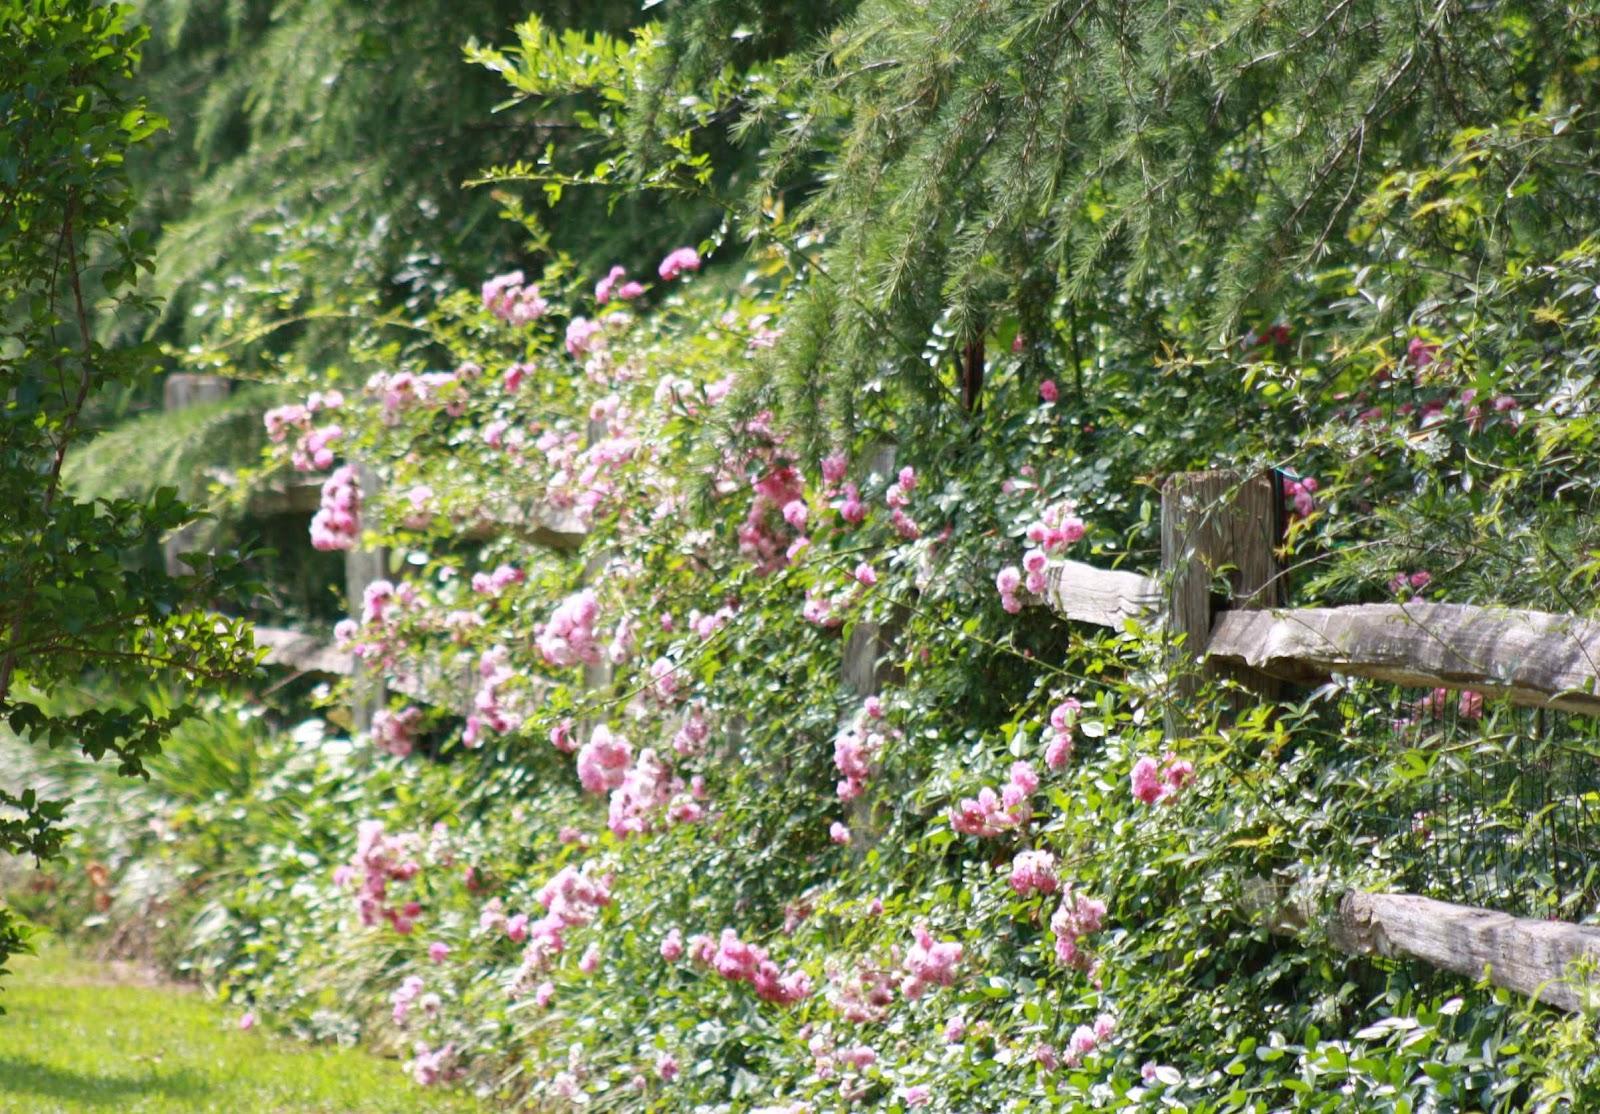 Roses and other gardening joys woodland wonderland garden tour - Rustic flower gardens ...